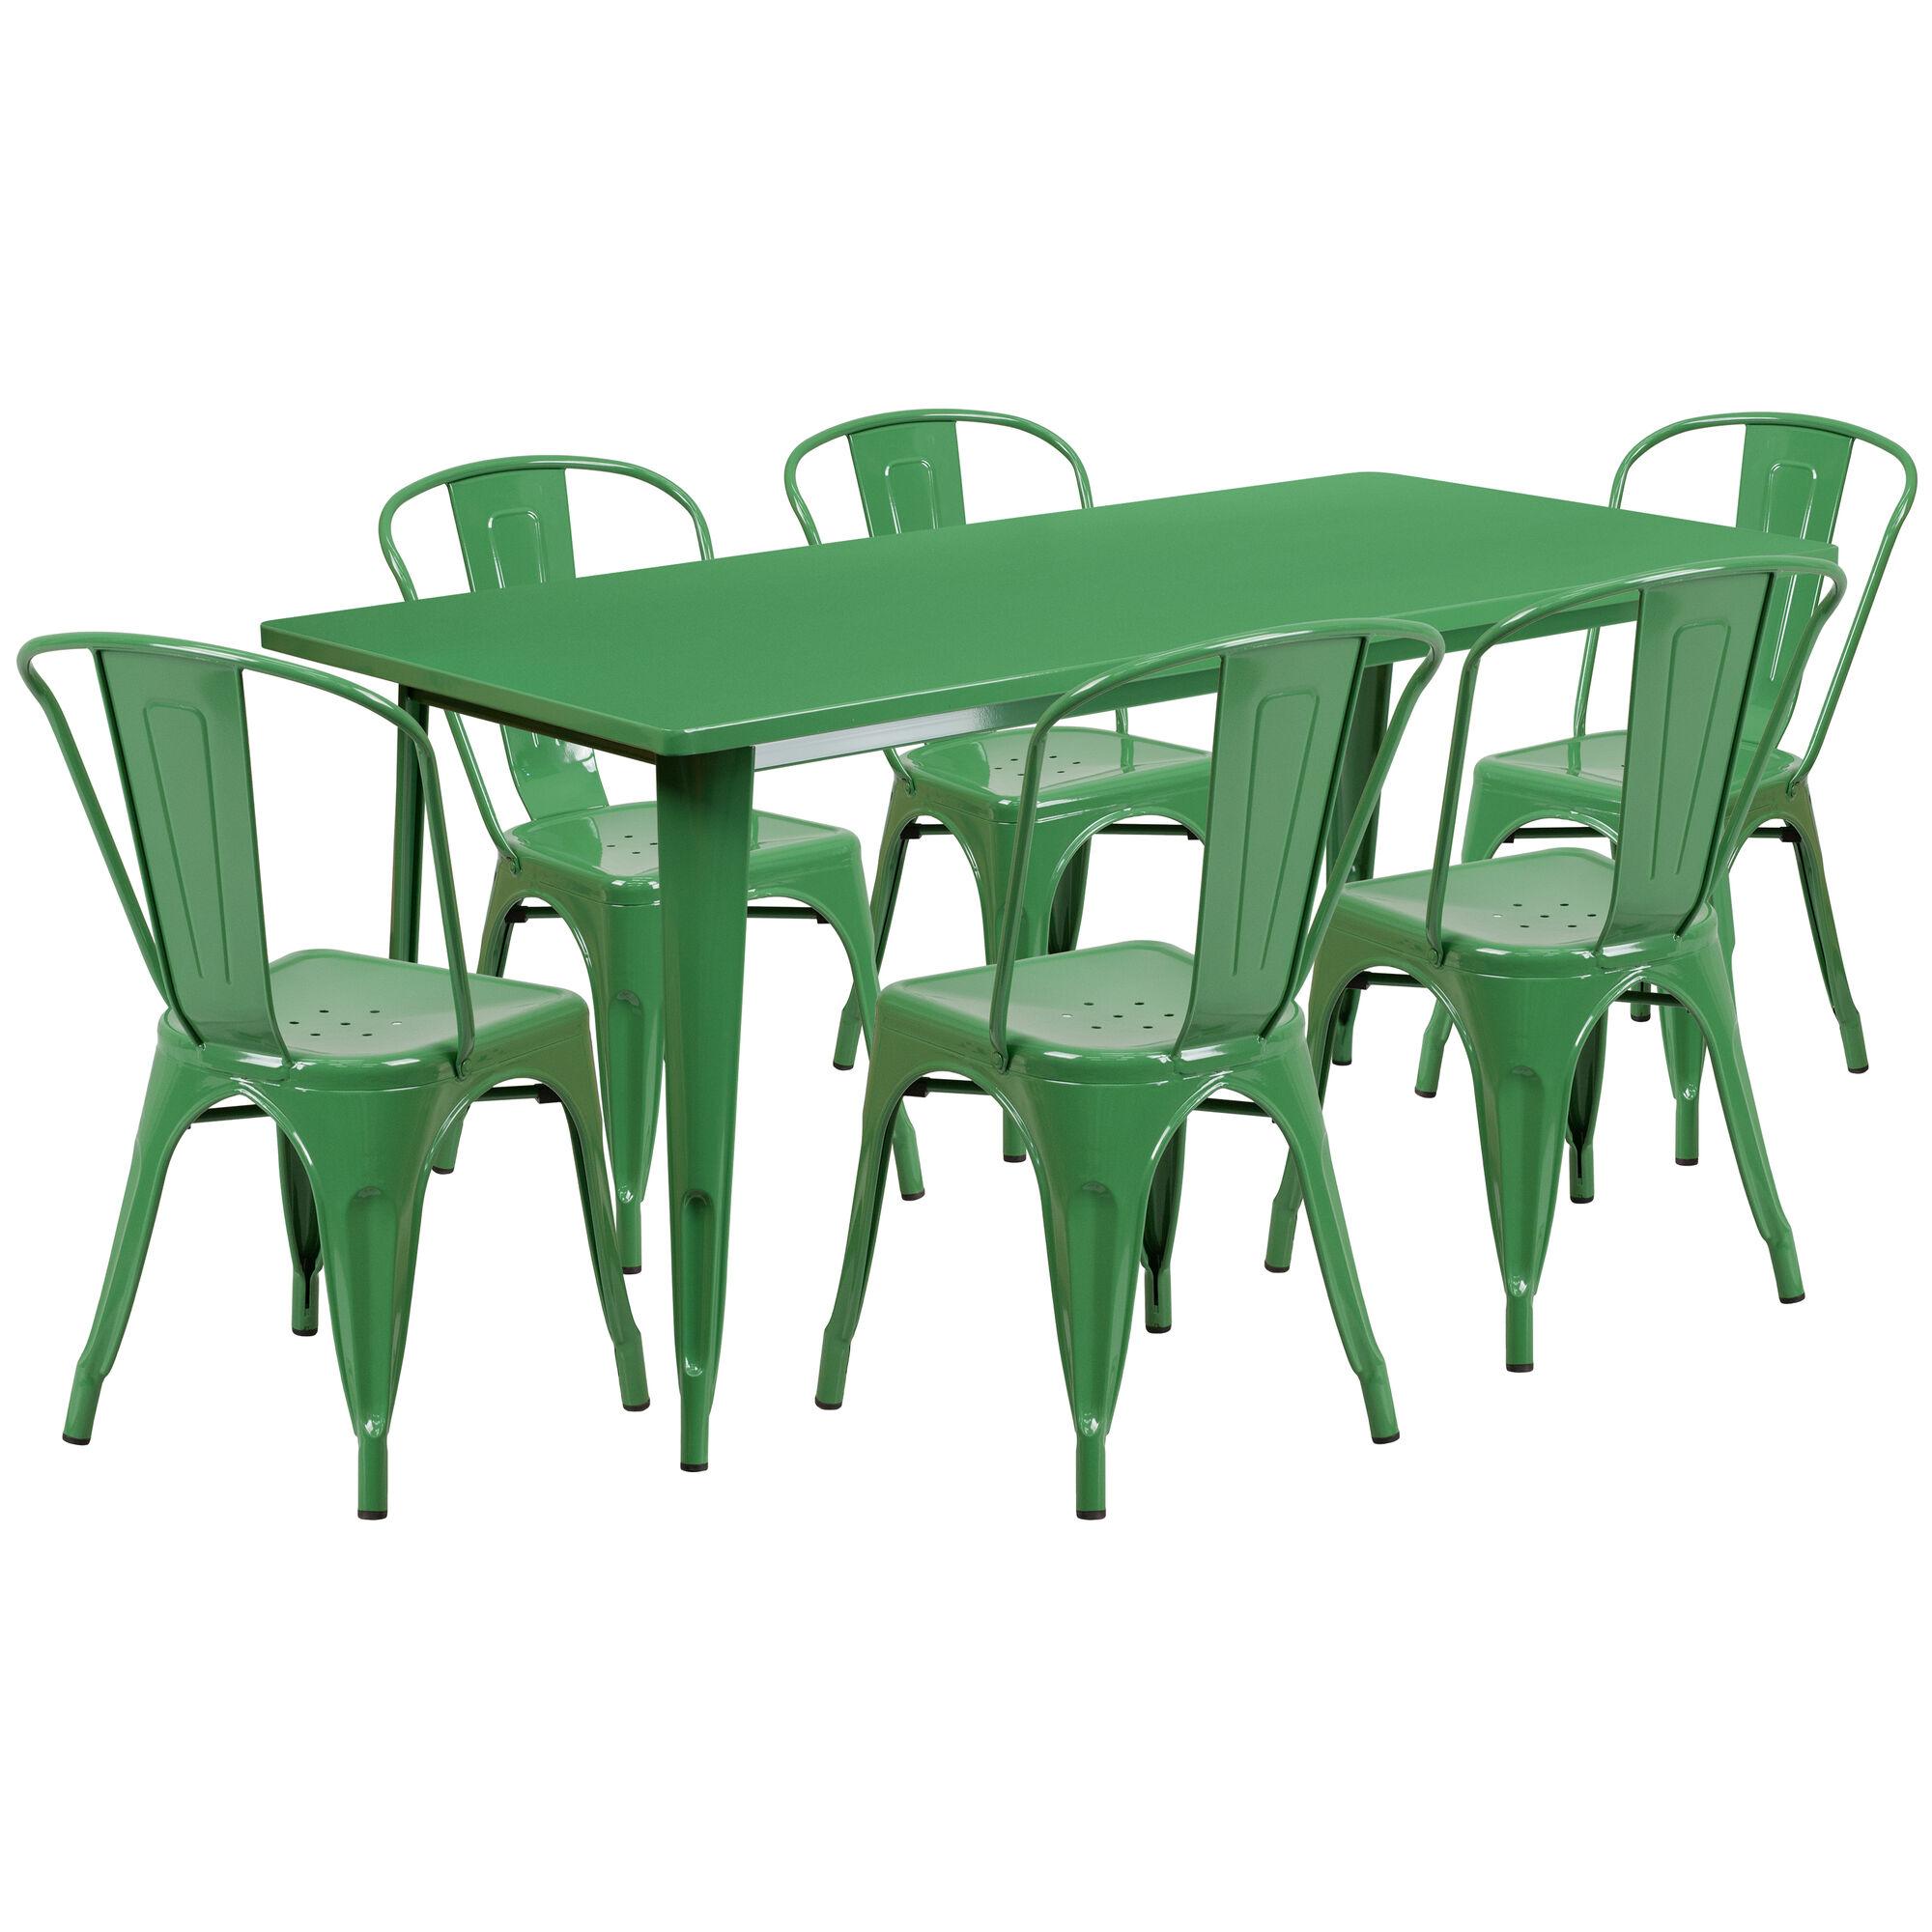 RestaurantFurniture4Less: Restaurant Table And Chair Sets Metal